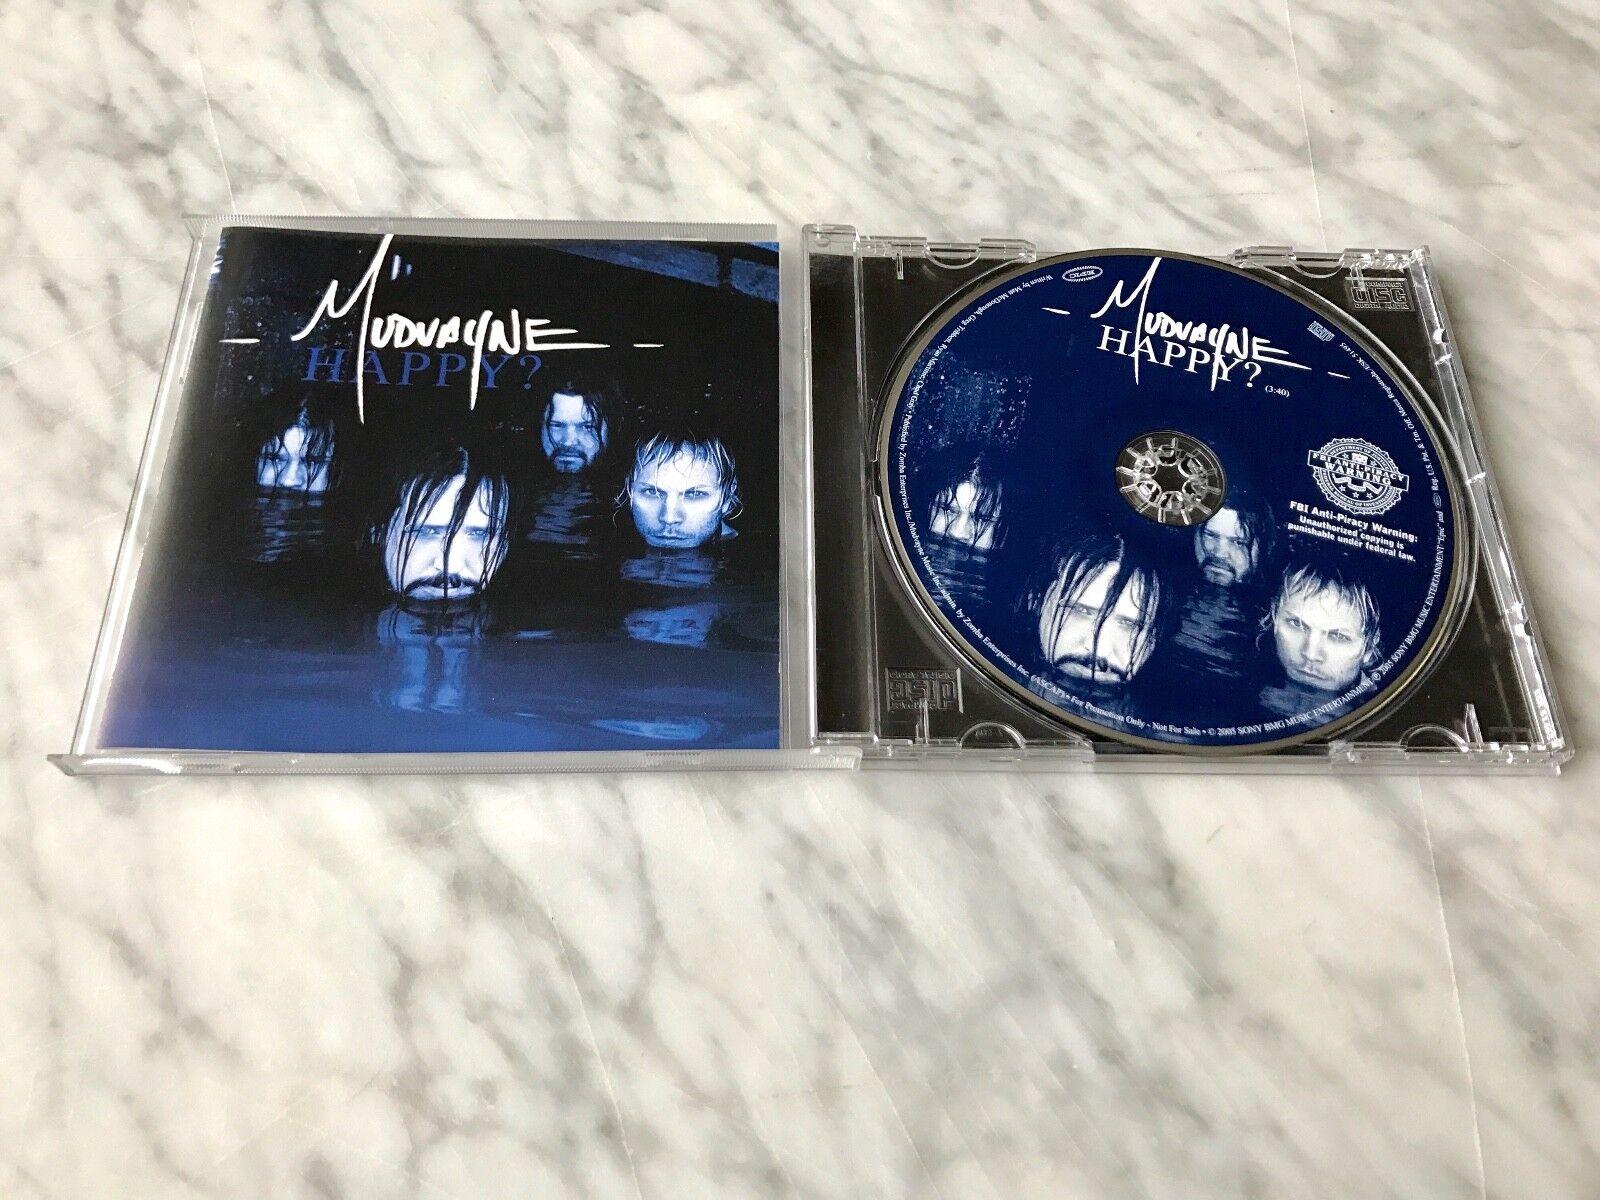 Mudvayne Happy? CD PROMO Single Original 2005 Epic Hell Yeah, Pantera Chad Gray